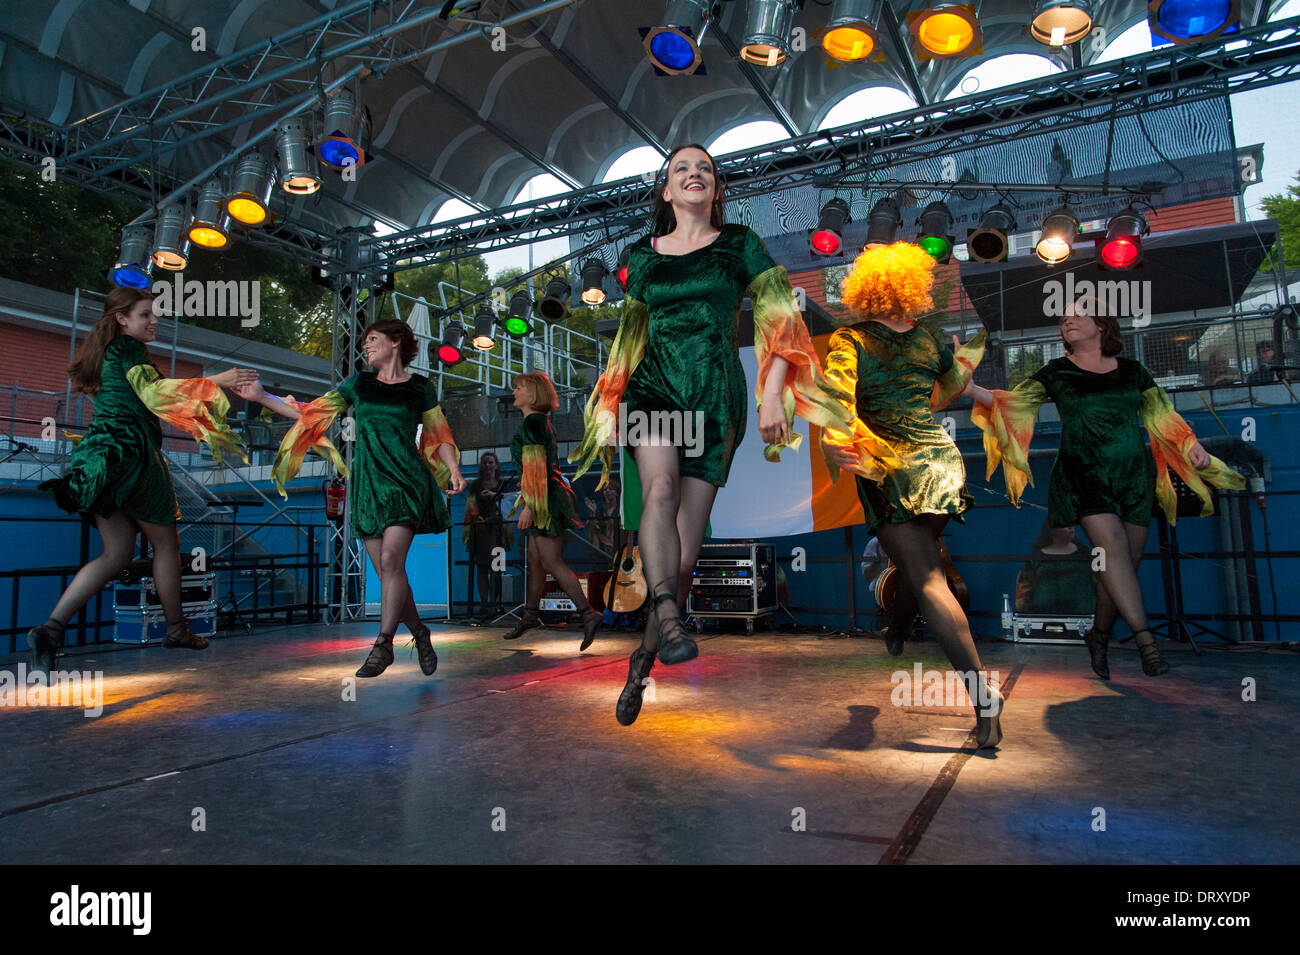 The Irish Dance Ensemble CEILI performs traditional Irish dances on a stage. - Stock Image